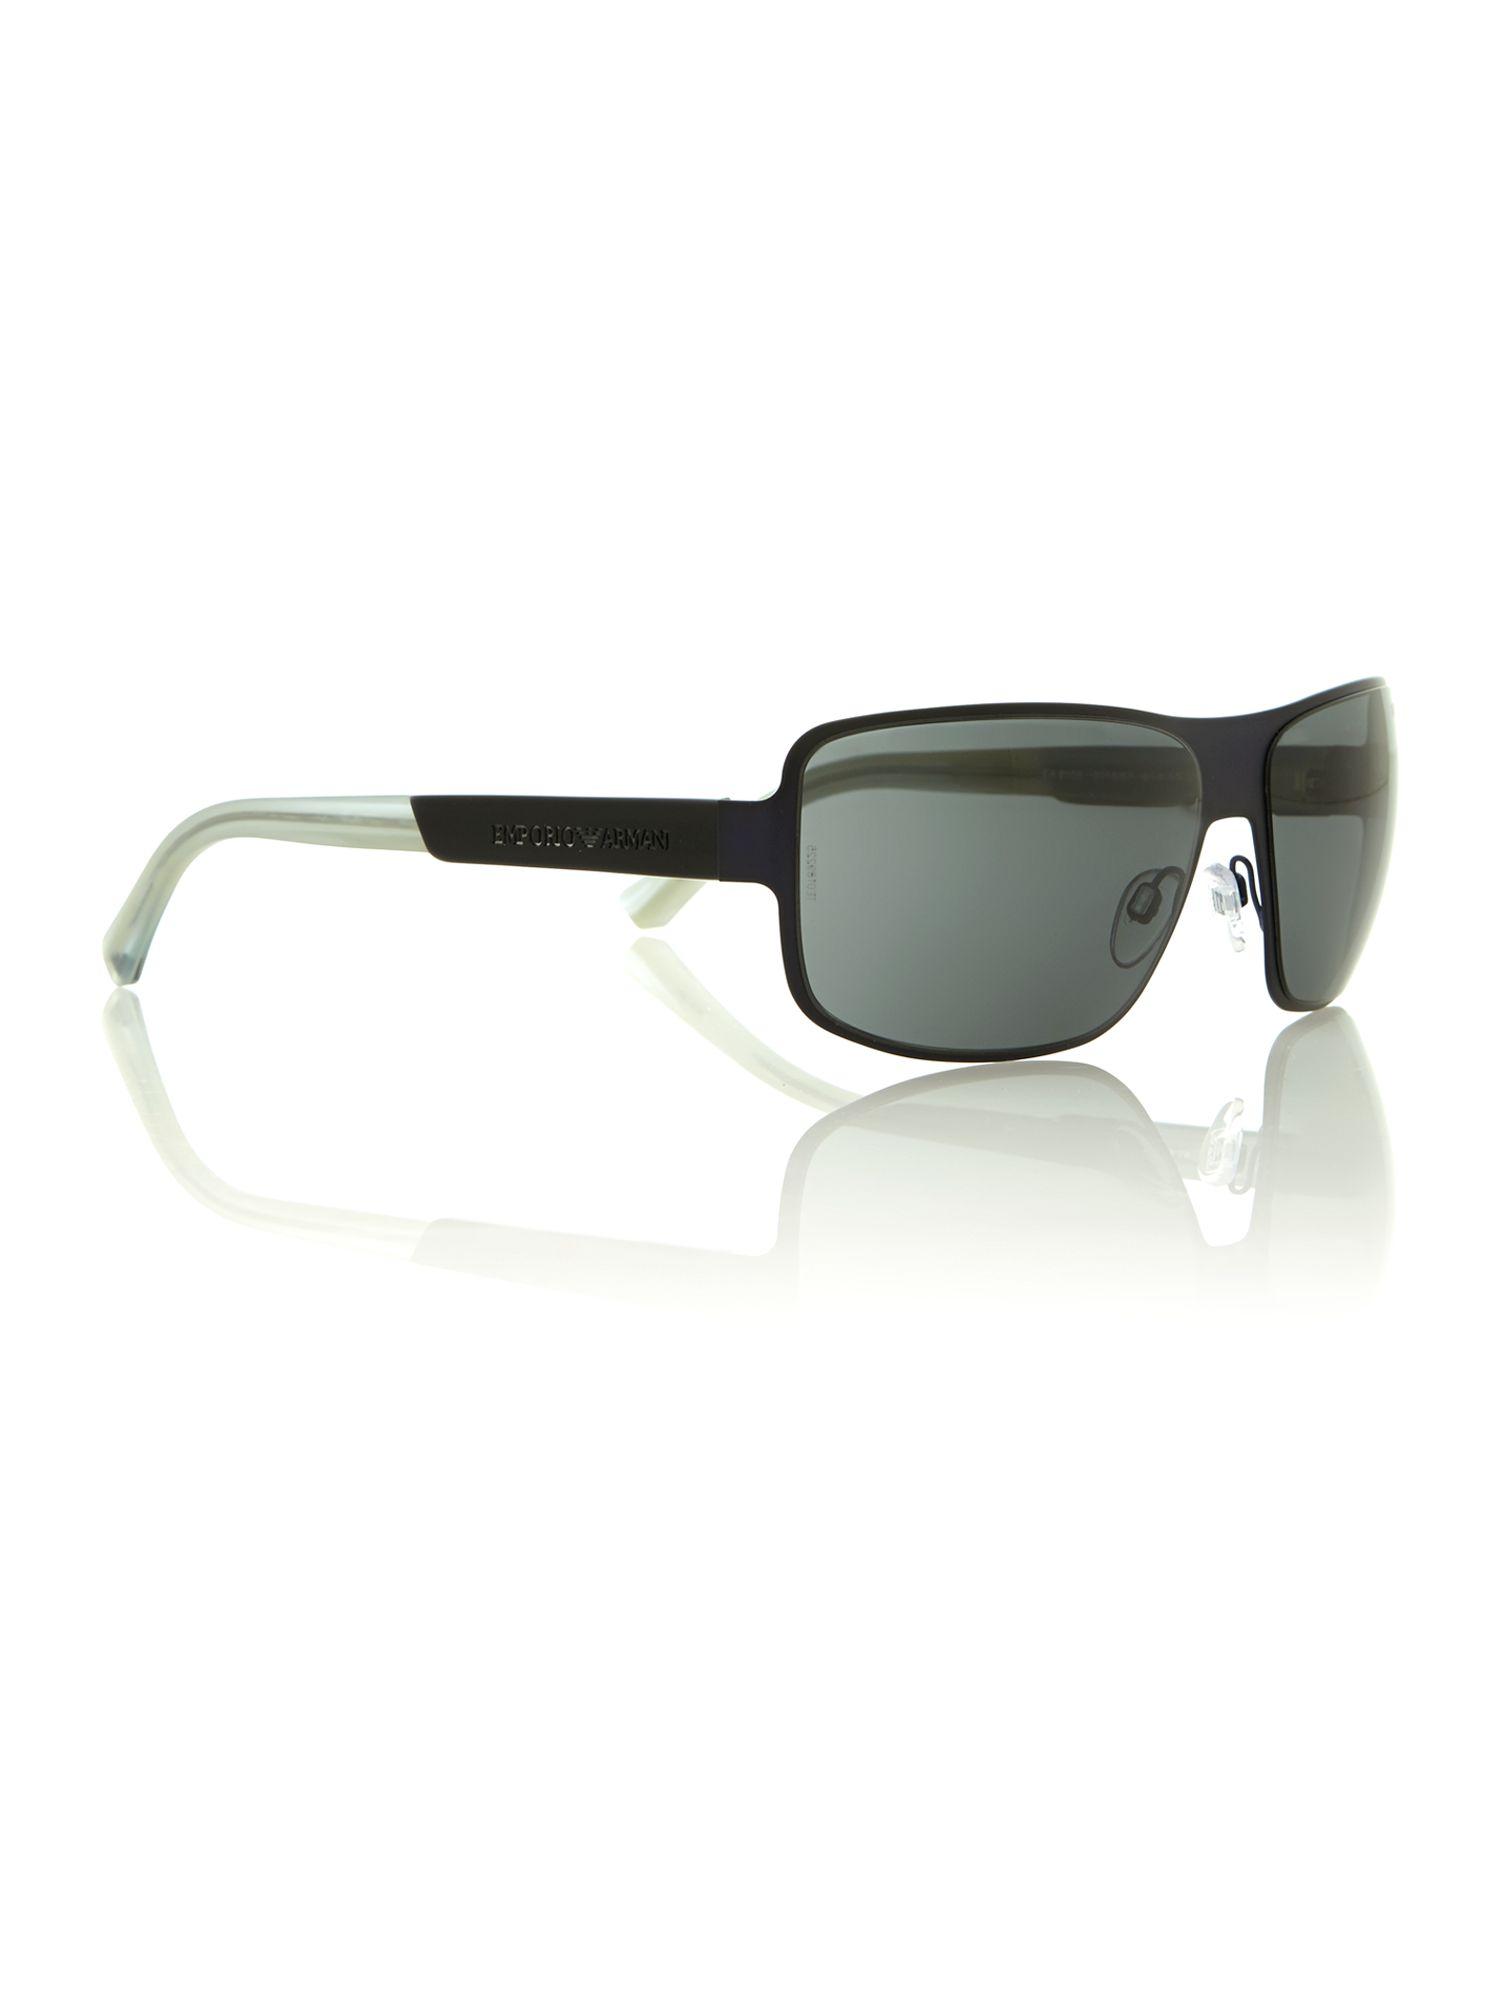 065873e223c0 Armani Sunglasses Mens Blue